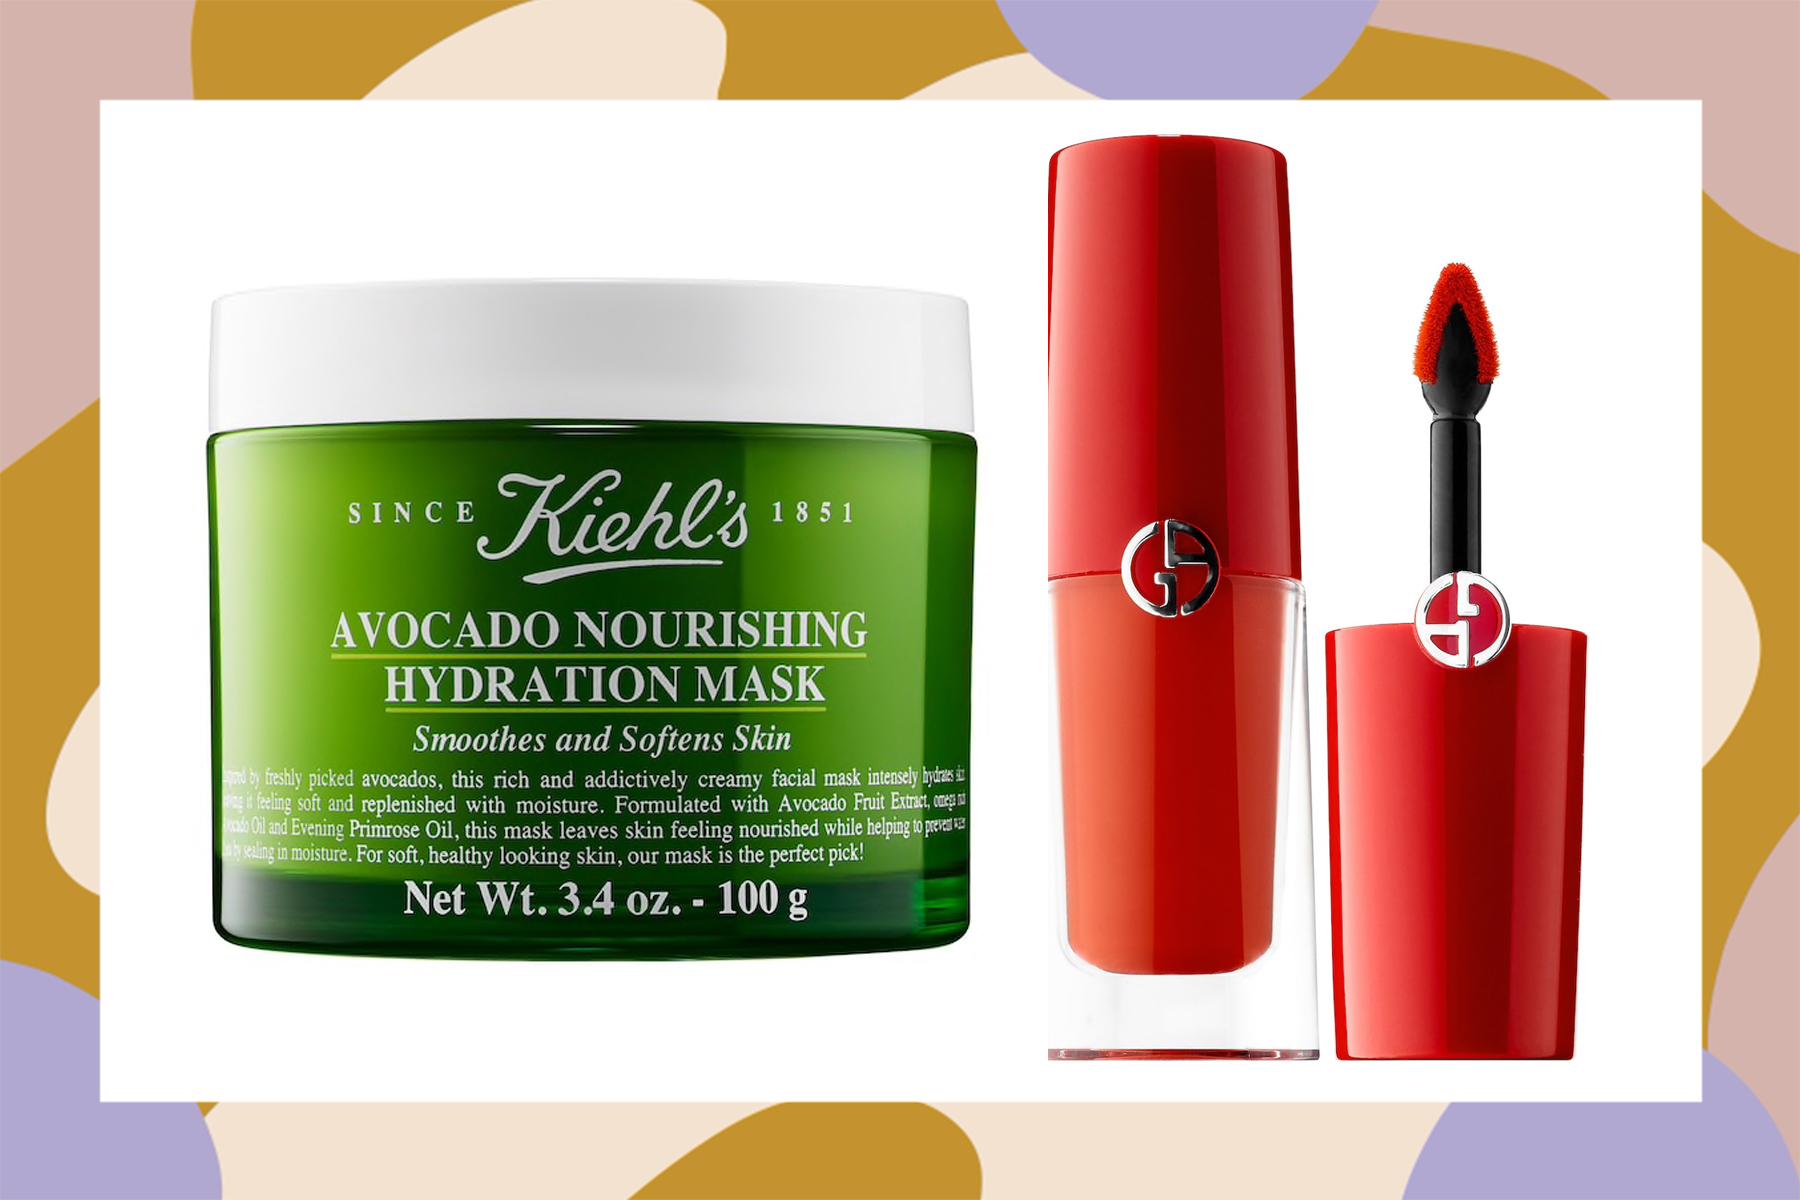 sephora black friday deals sale 2020 skincare makeup hair